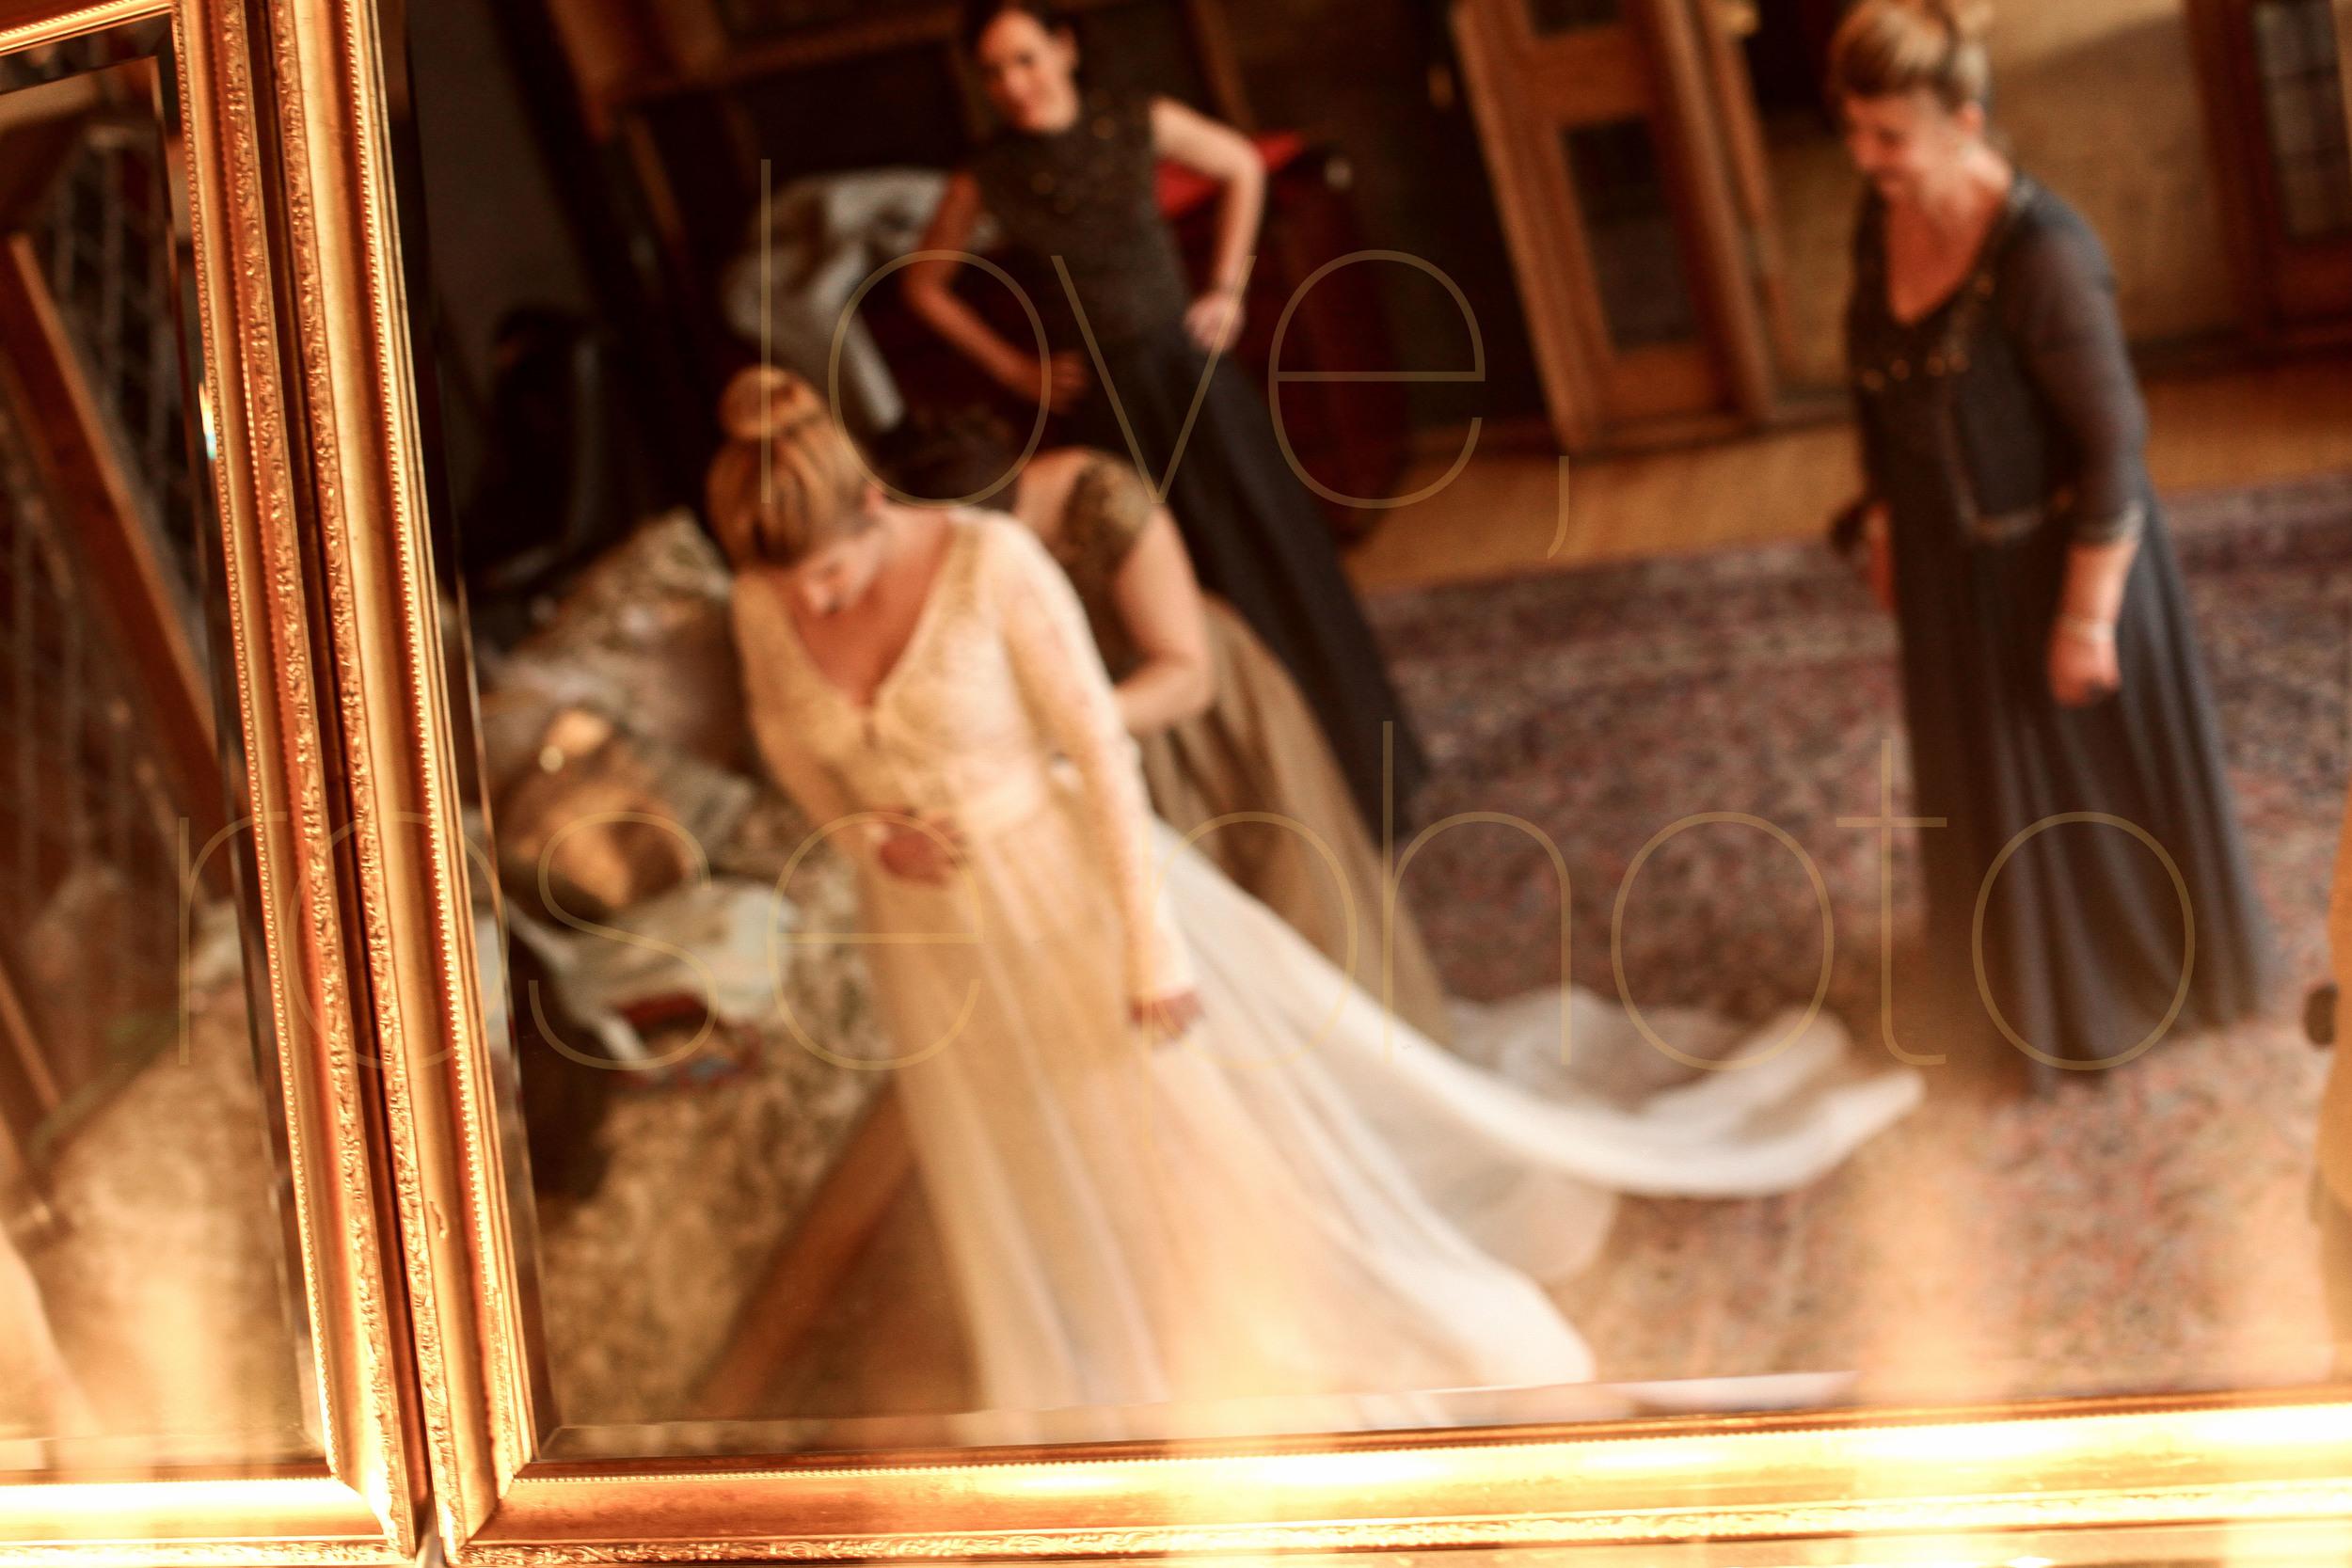 West Fulton Chicago Wedding Venue Salvage One photography enagement photos bride groom first dance-10.jpg